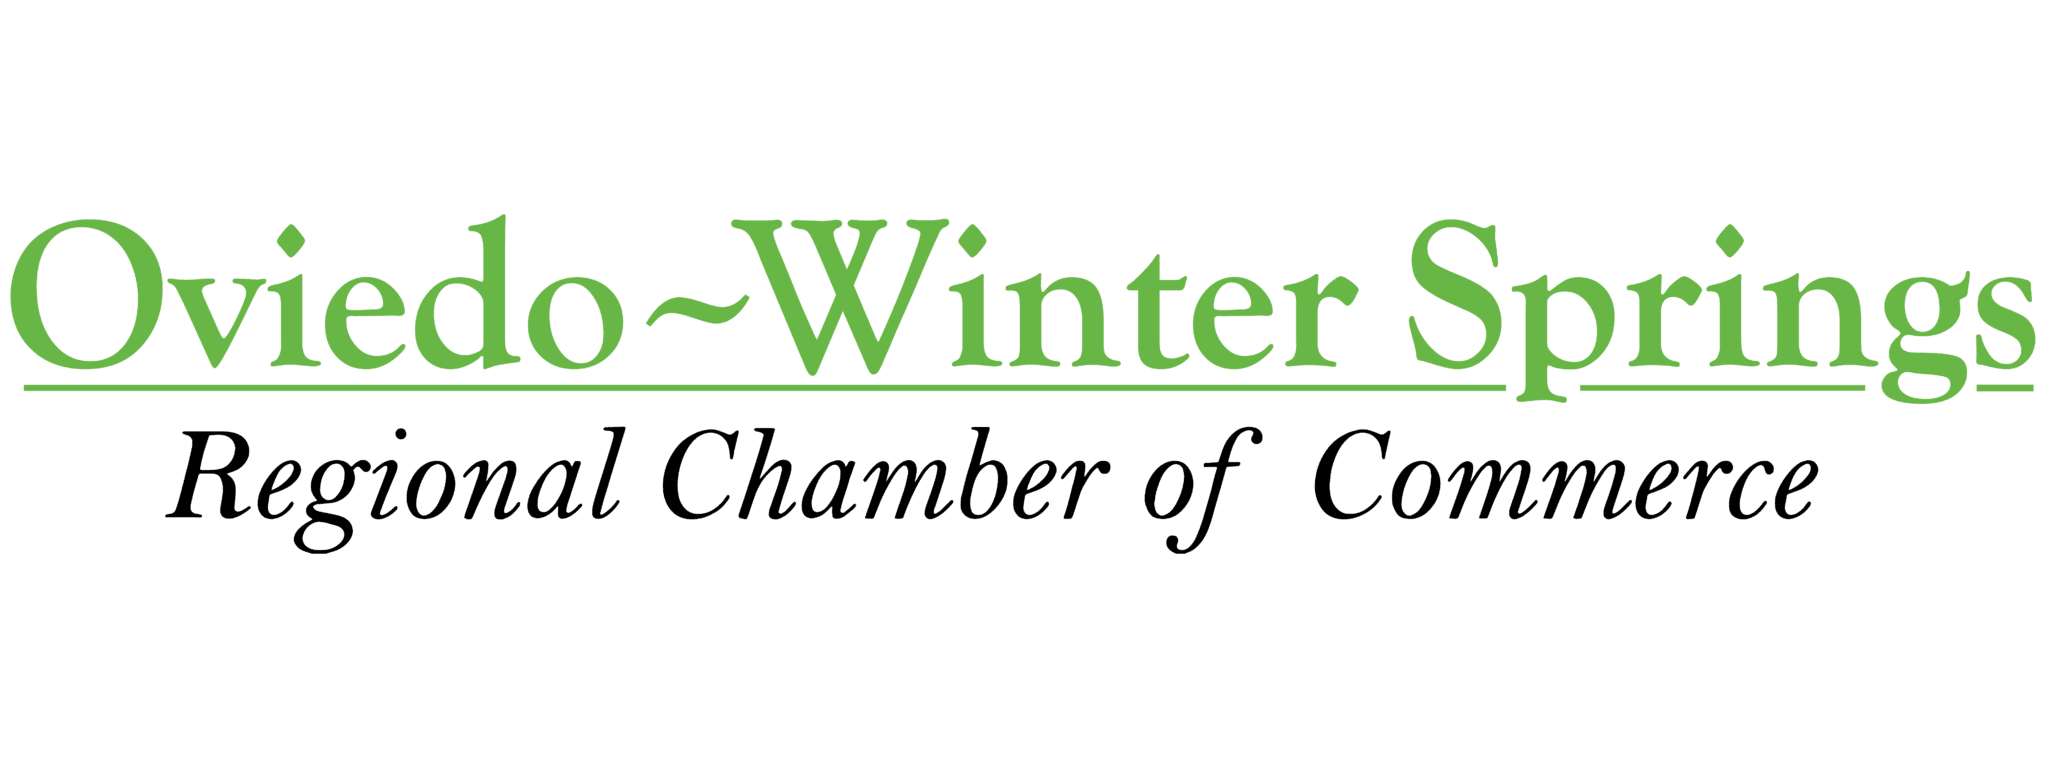 chamber-logo-01